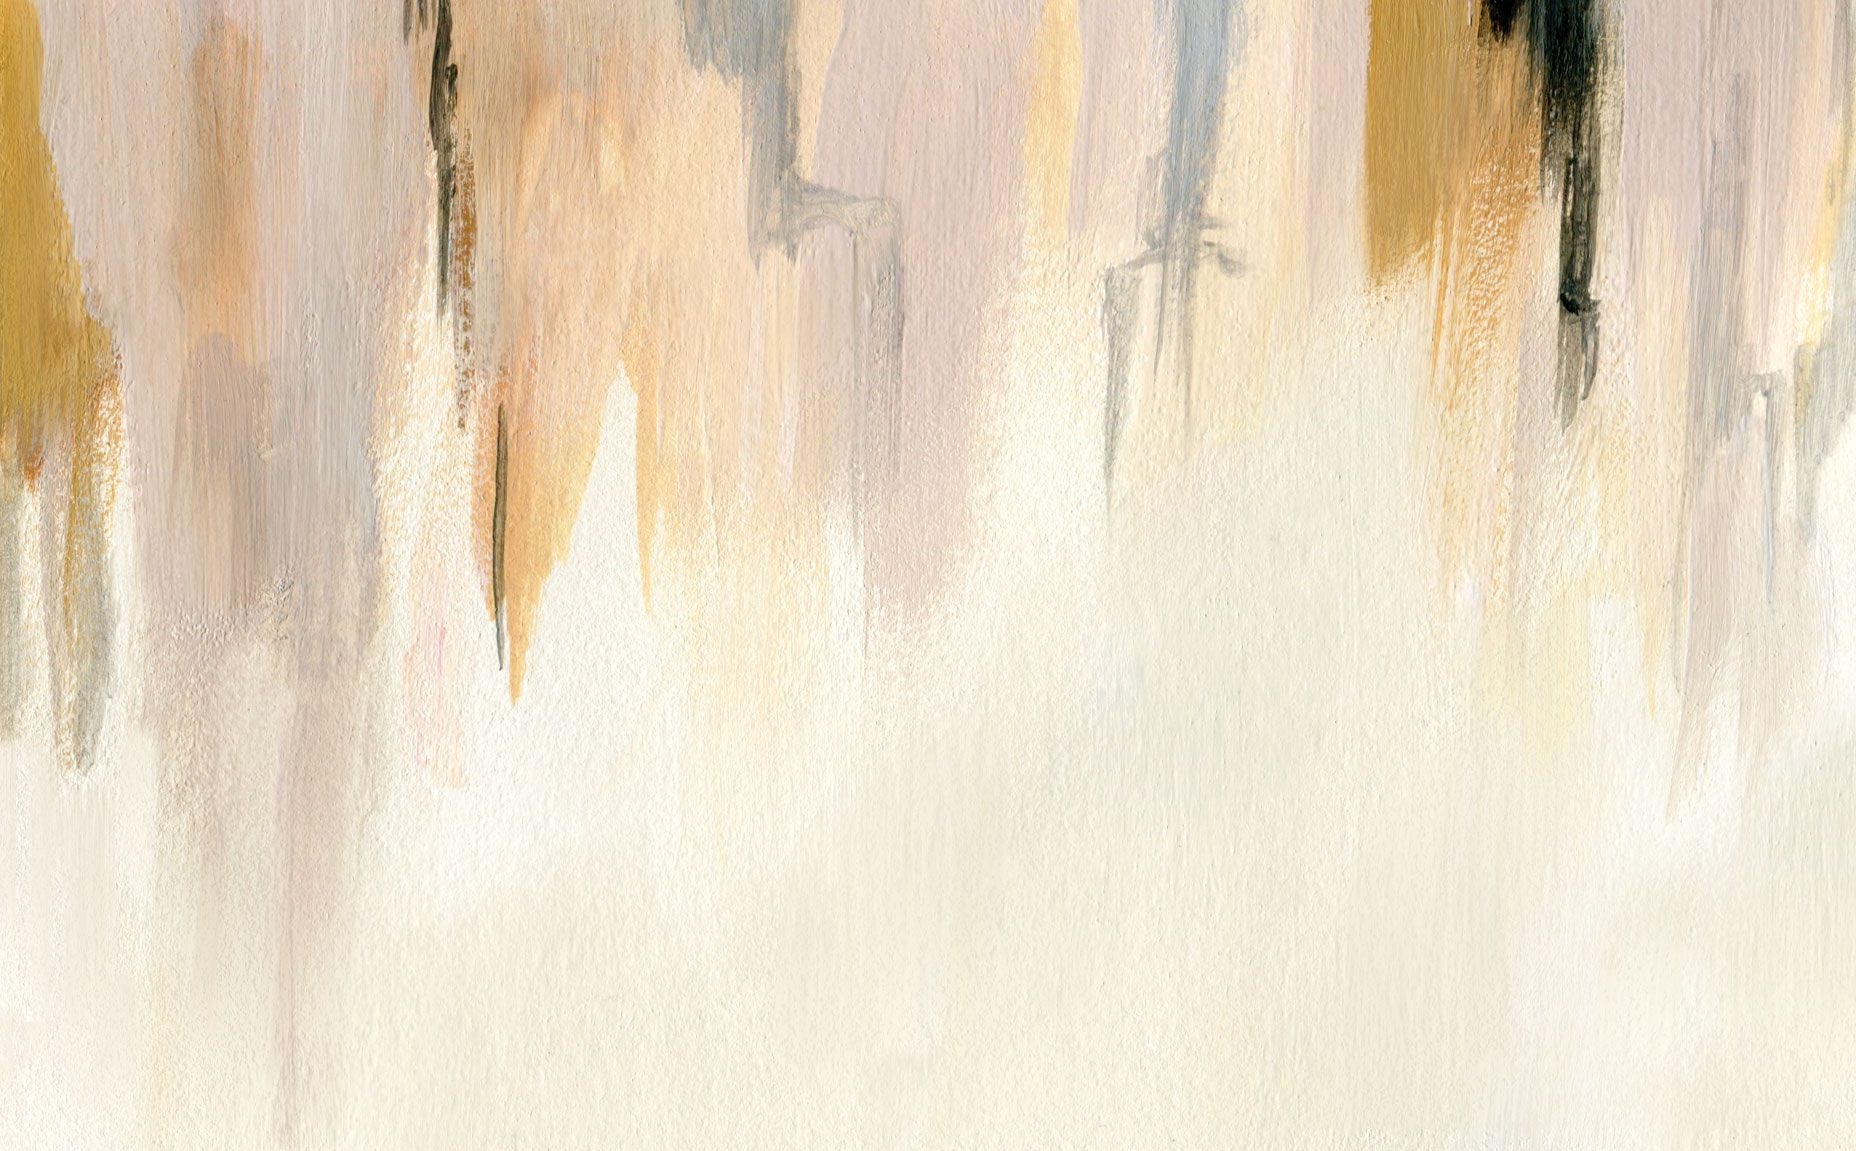 Great Wallpaper Mac Artsy - 117002c62b97282d025649627811e0bf  Photograph_508619.jpg